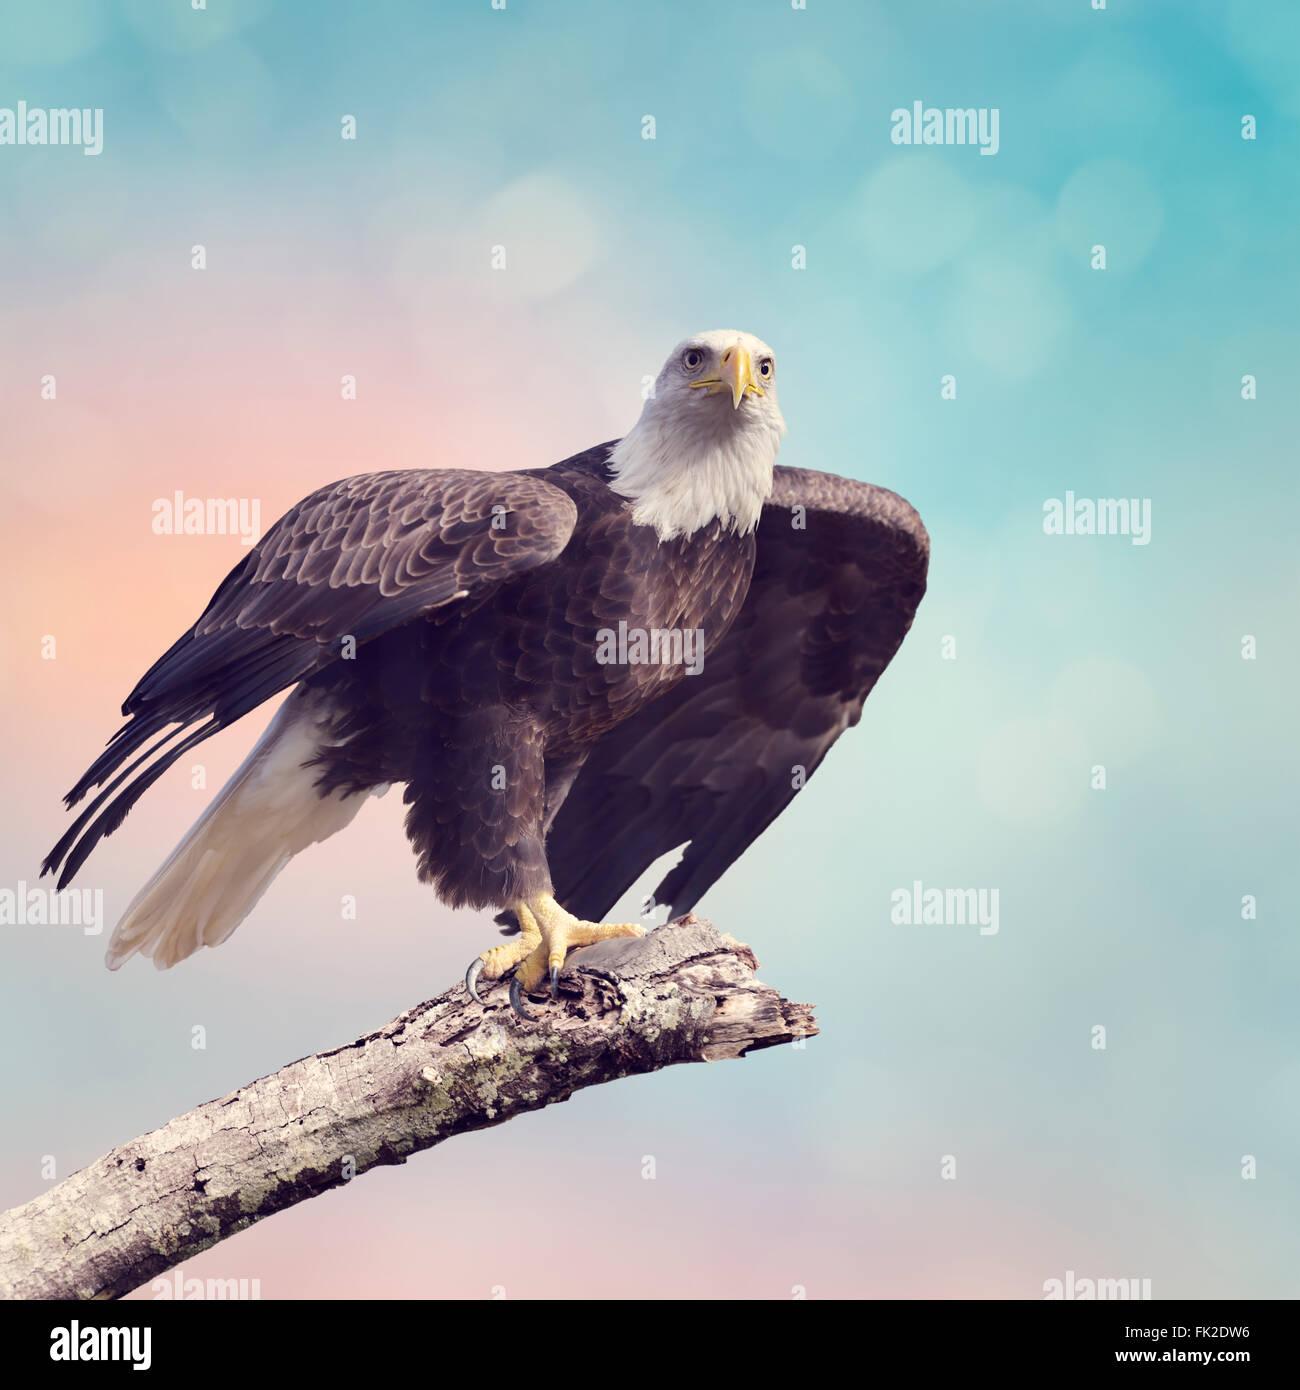 A Bald Eagle  Taking off - Stock Image